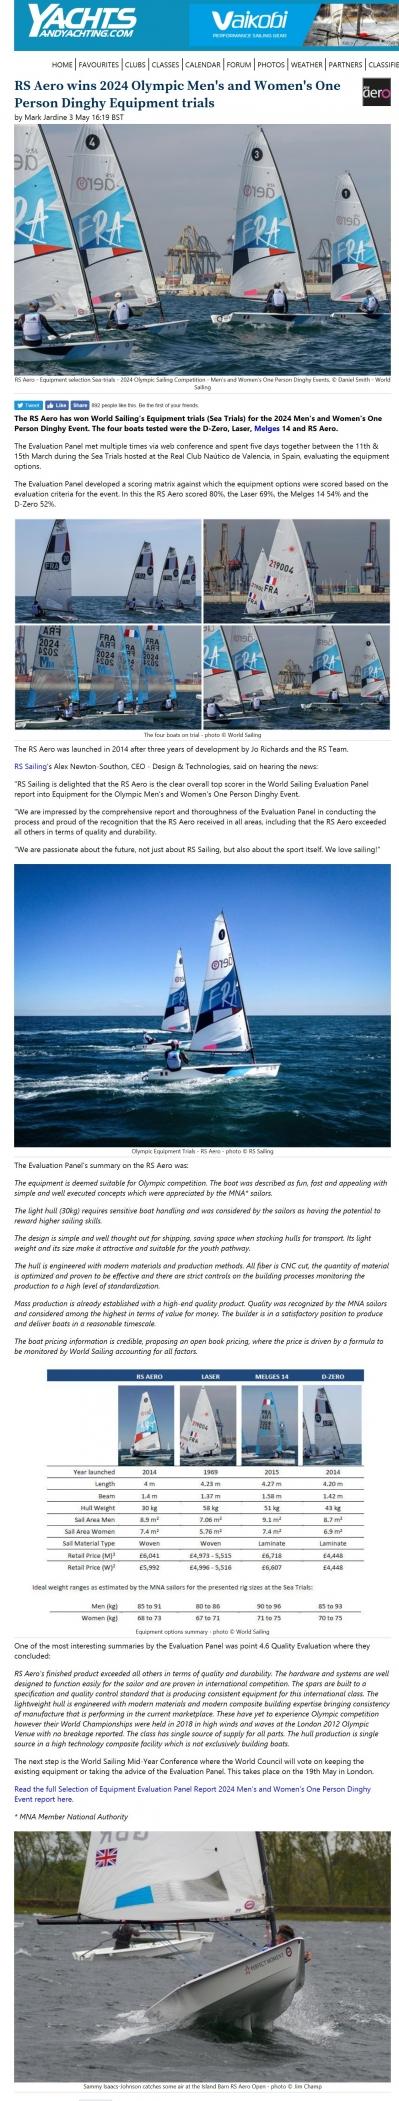 Jpeg-www_yachtsandyachting_com_news_2170